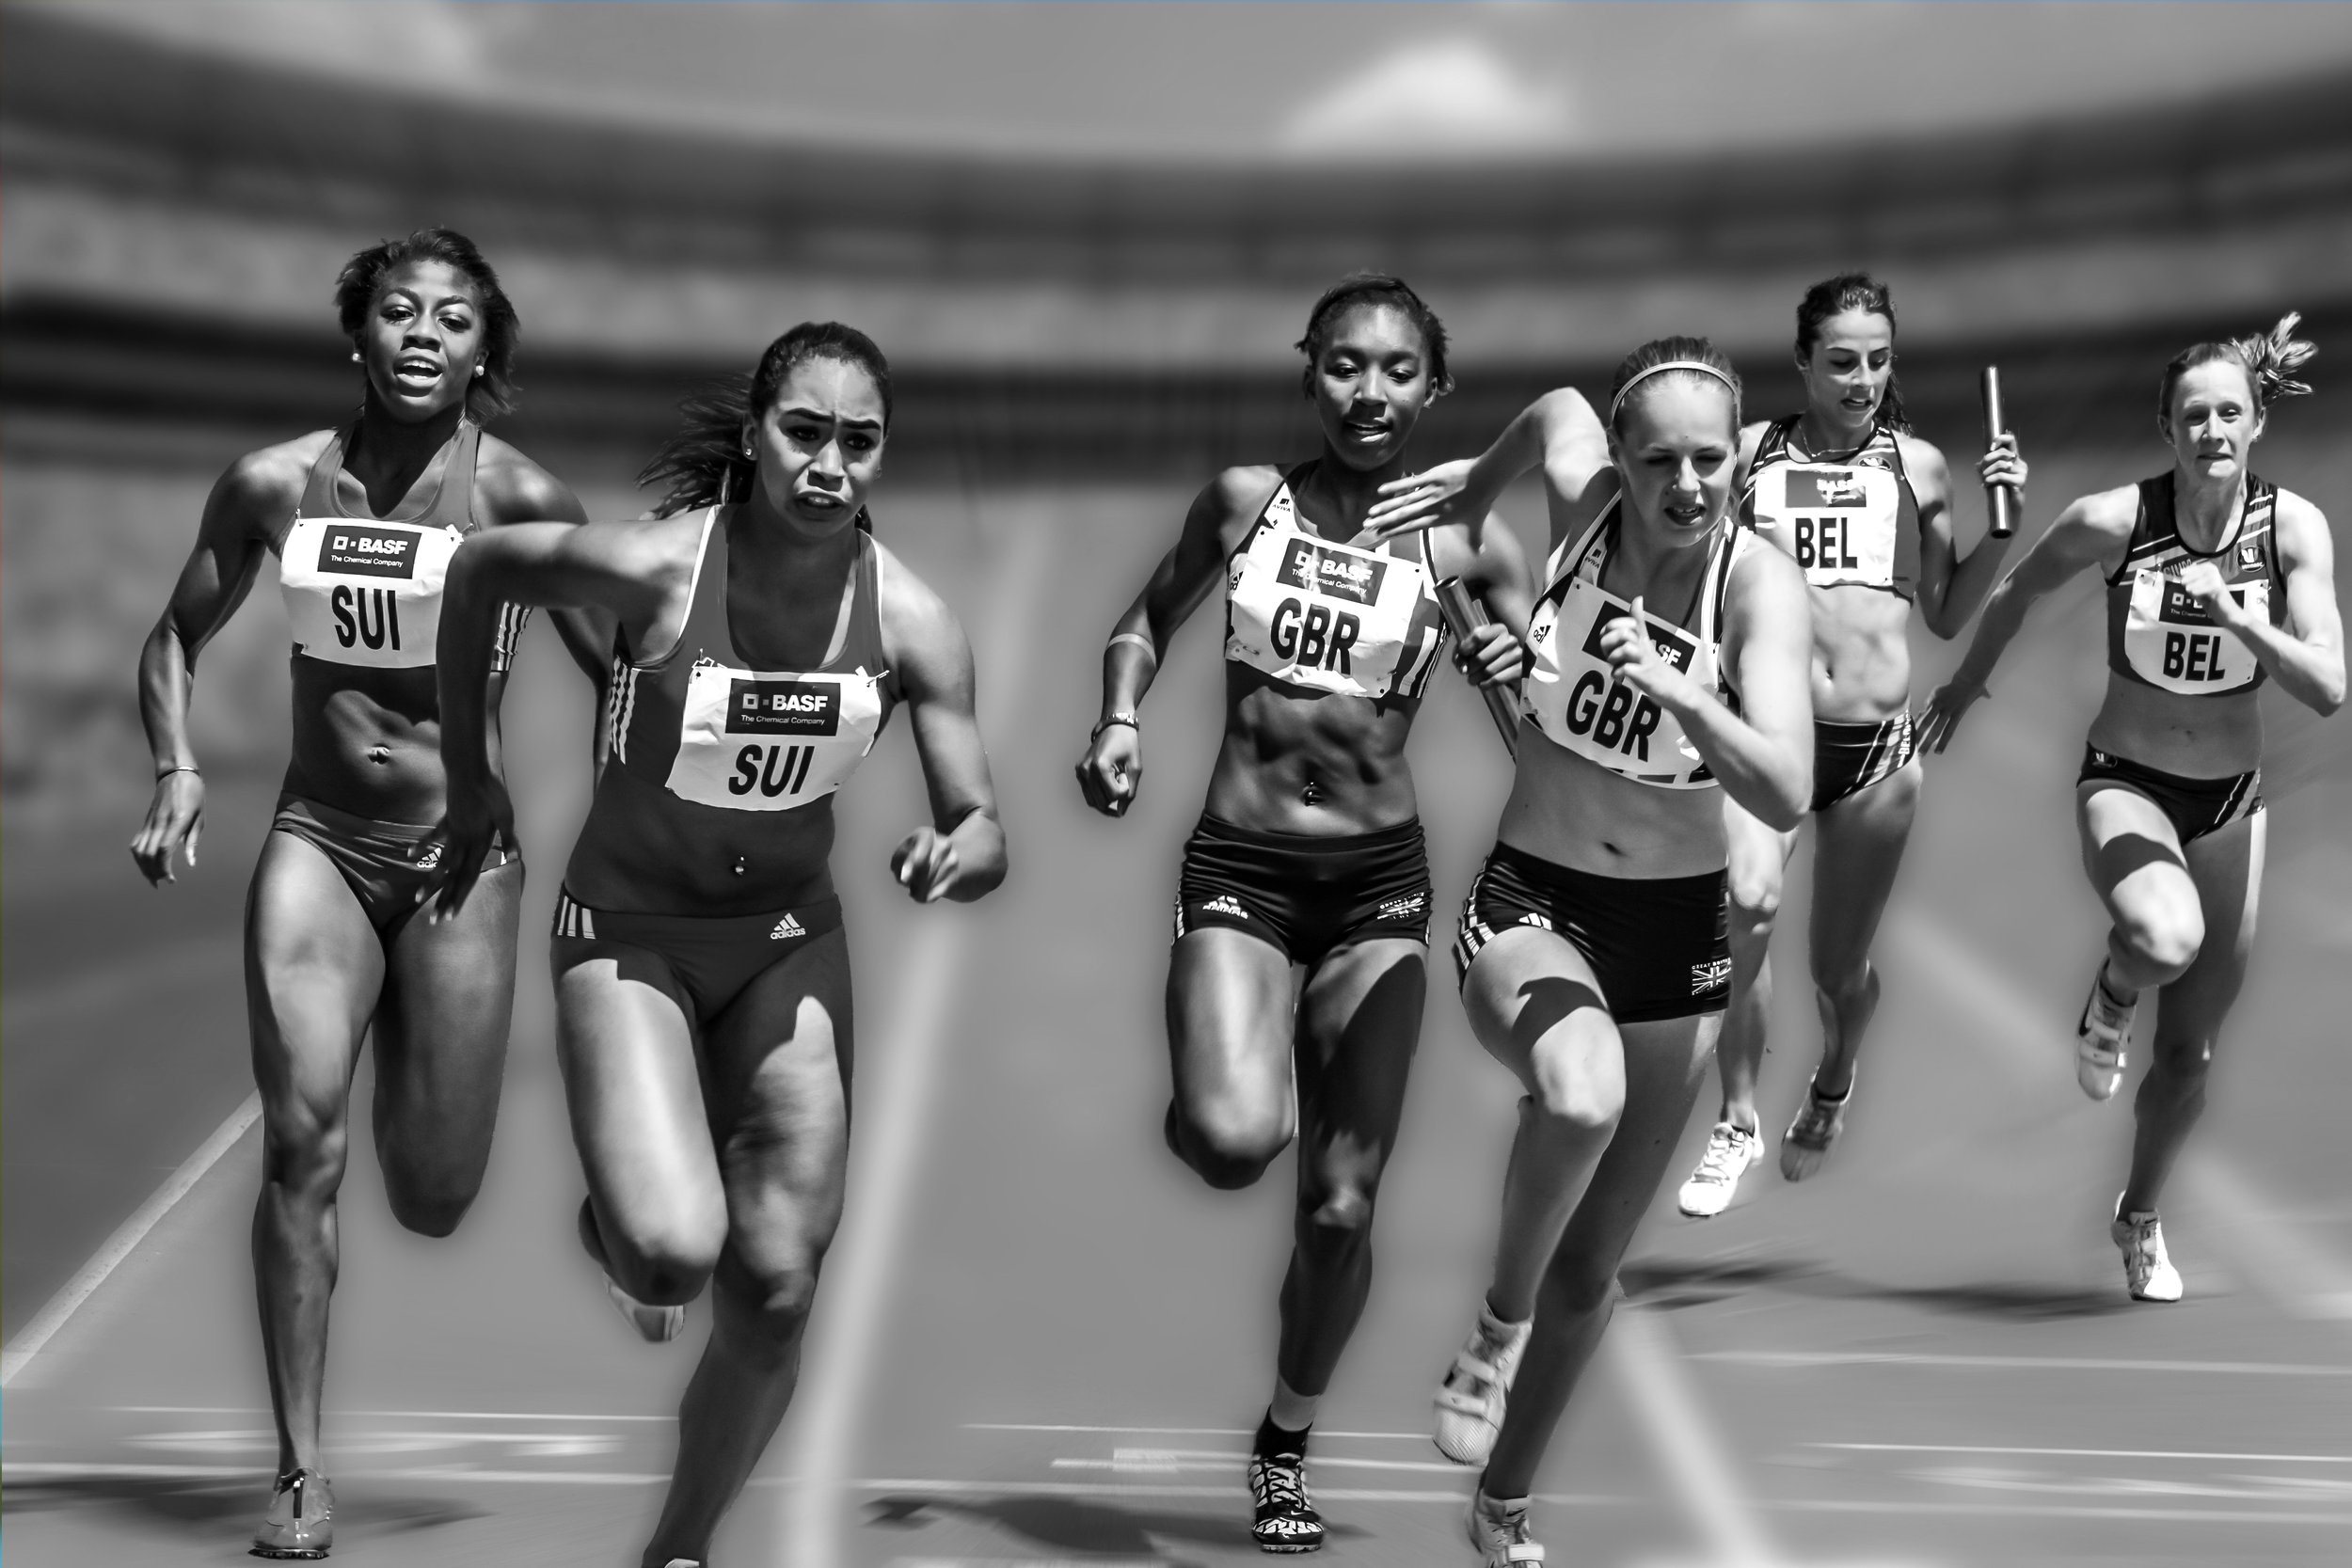 relay-race-competition-stadium-sport.jpg